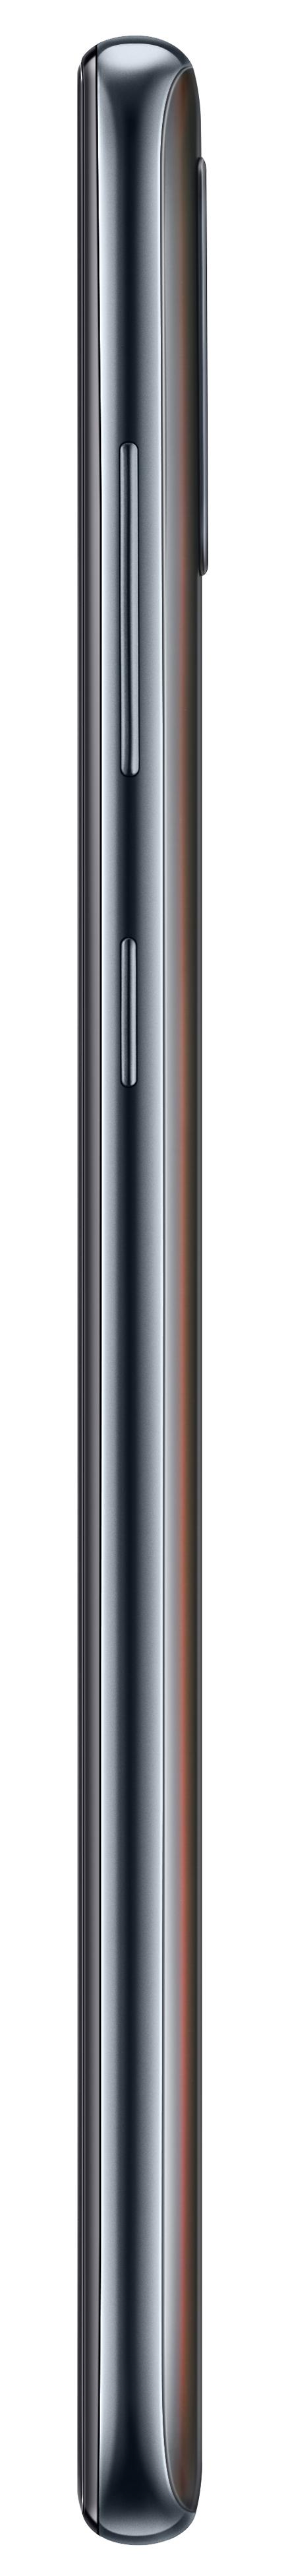 Samsung SM-A705F